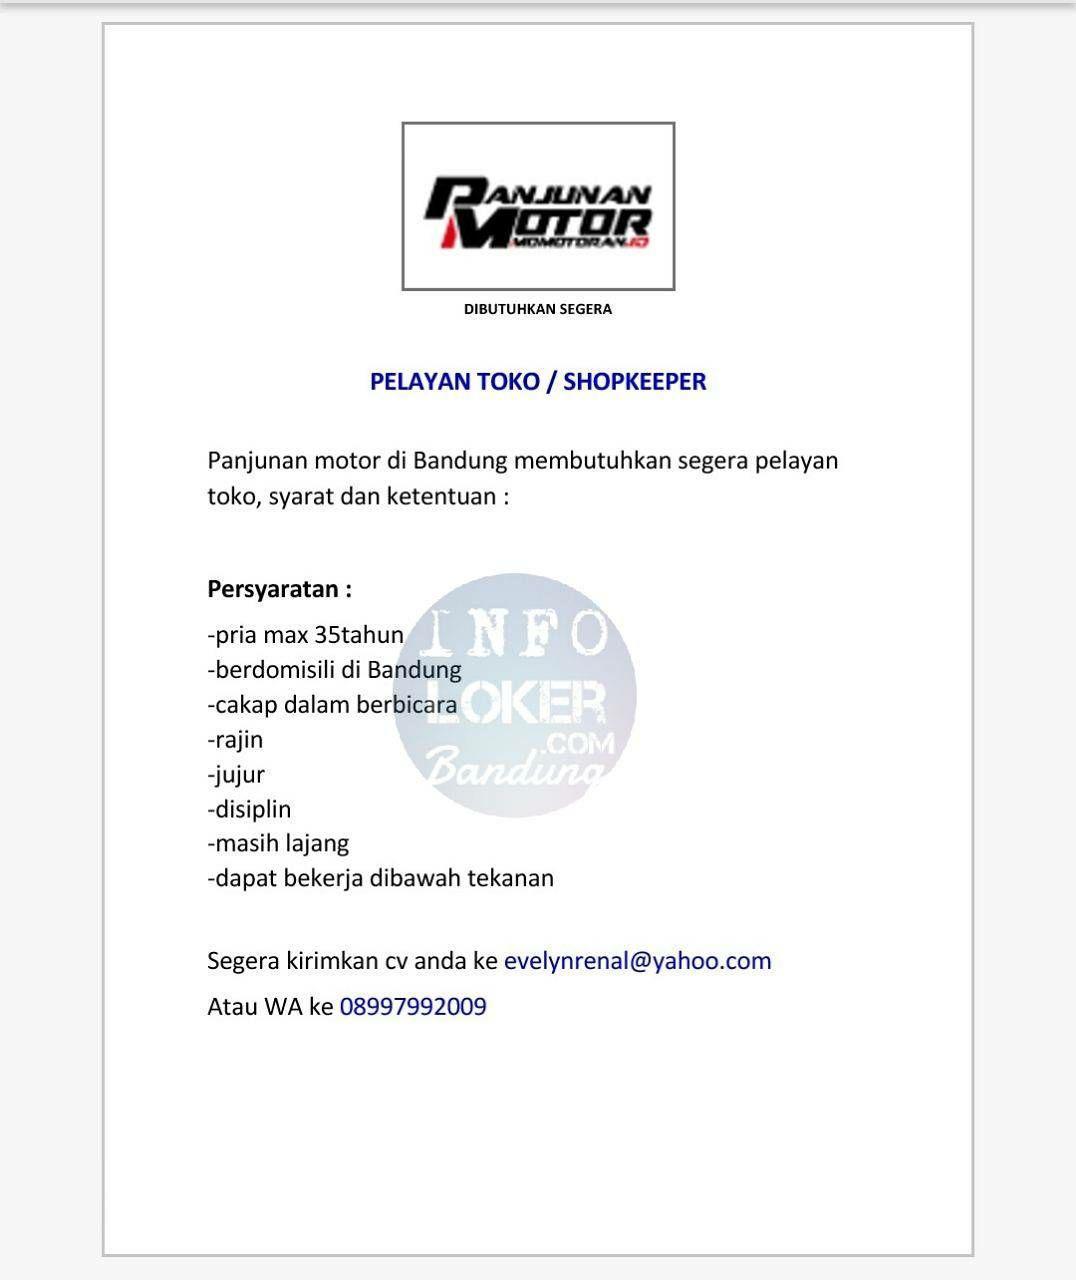 Lowongan Kerja Panjunan Motor Bandung Januari 2018